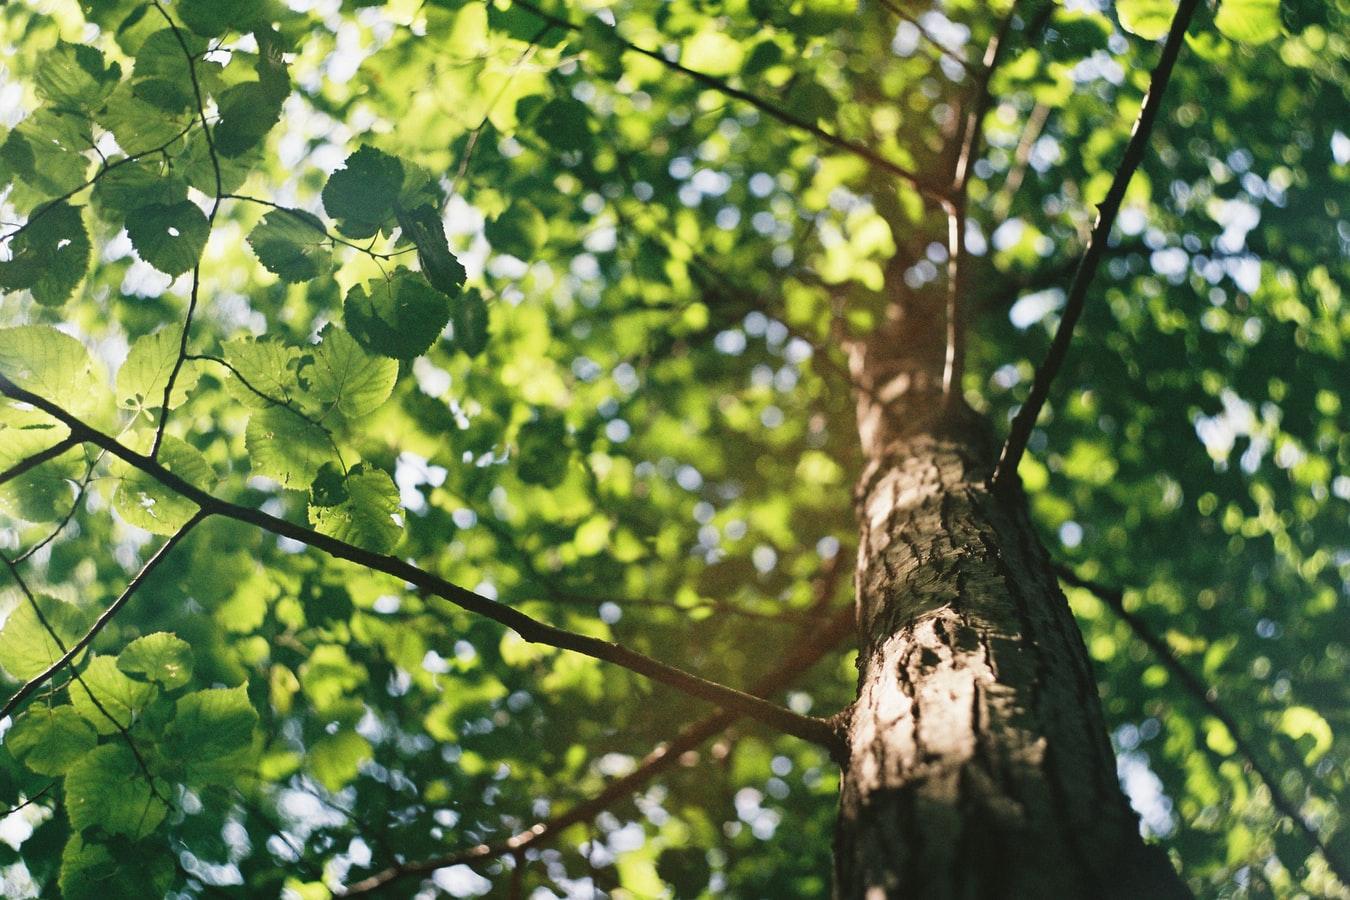 Greenbelt Forest Preserve North Chicago, IL